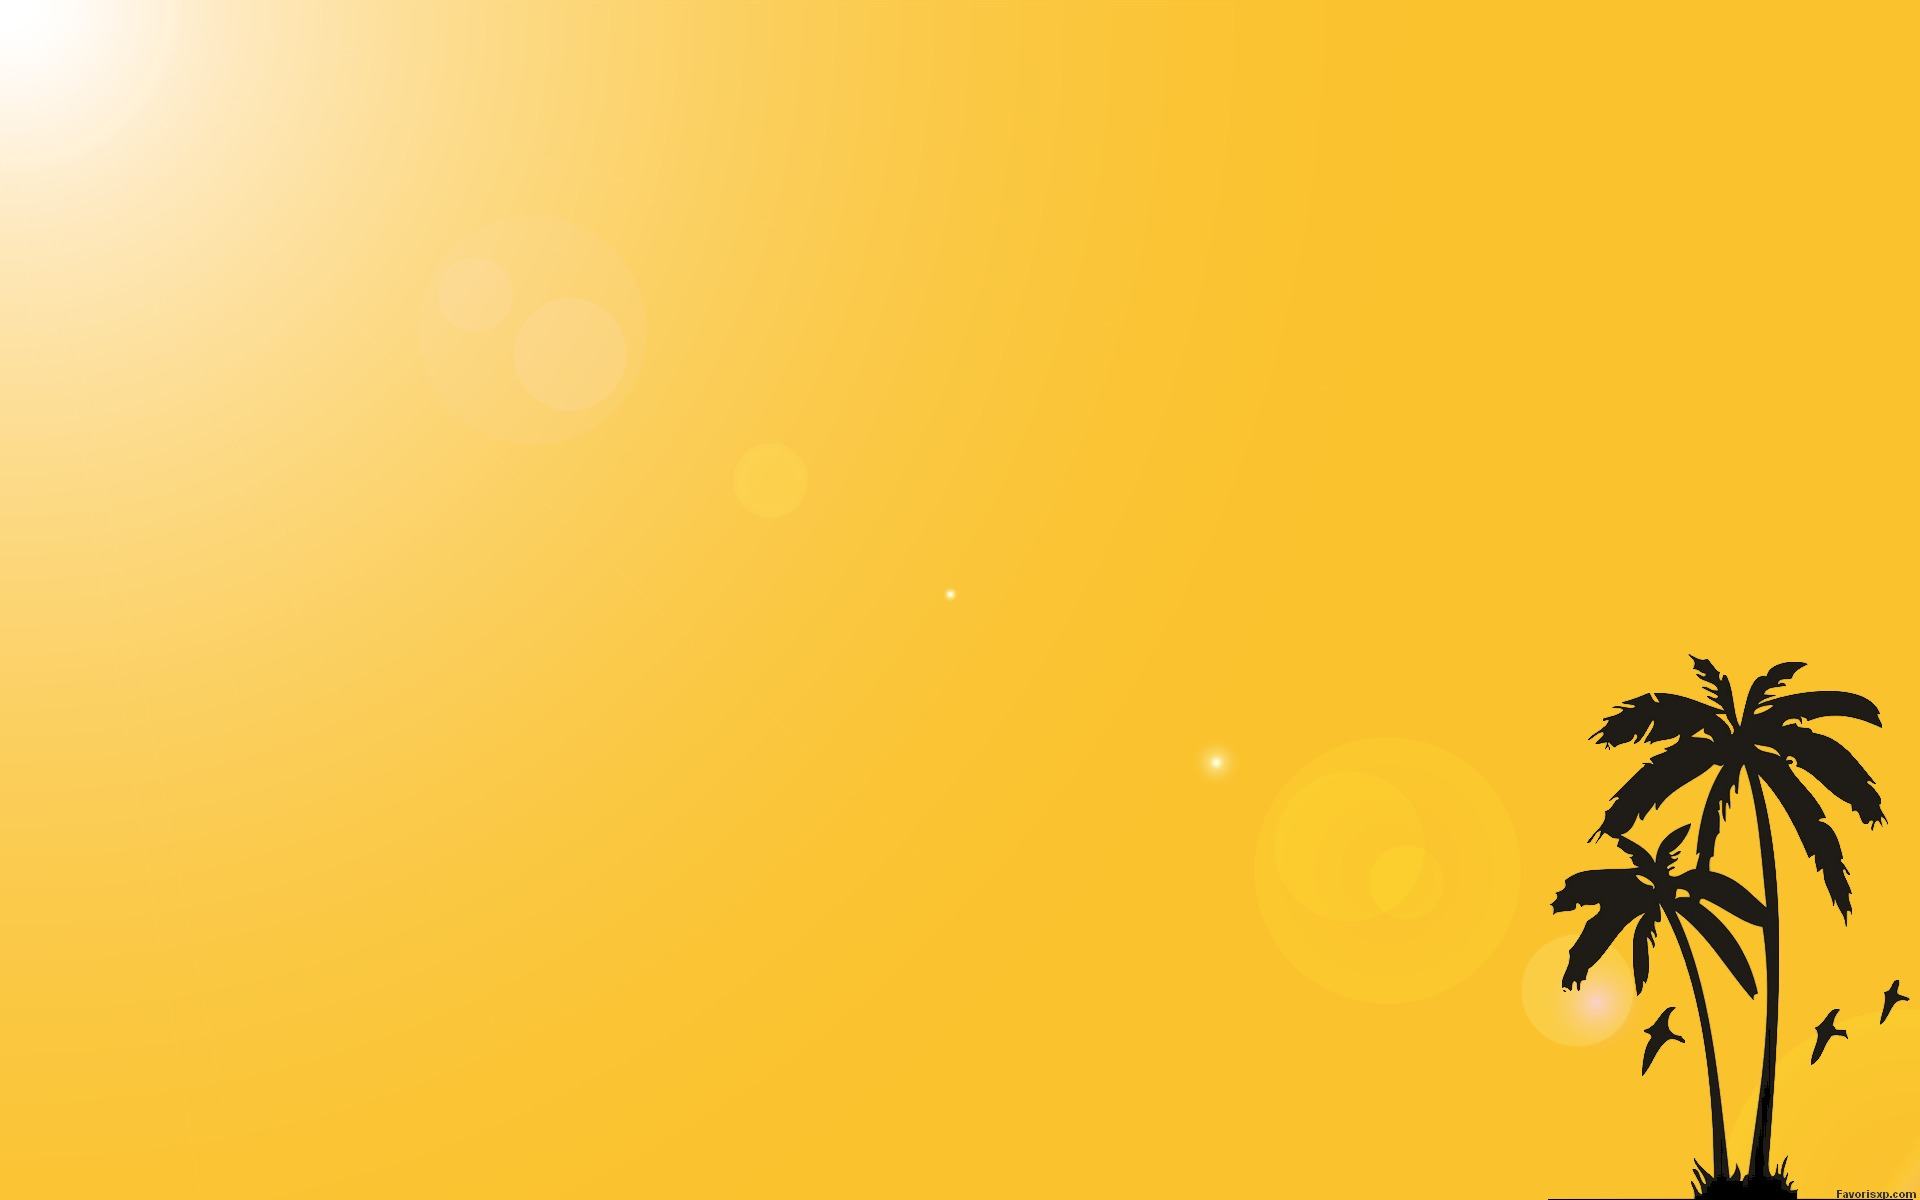 Fonds d 39 cran couleur jaune en wallpapers for Fond ecran grand format